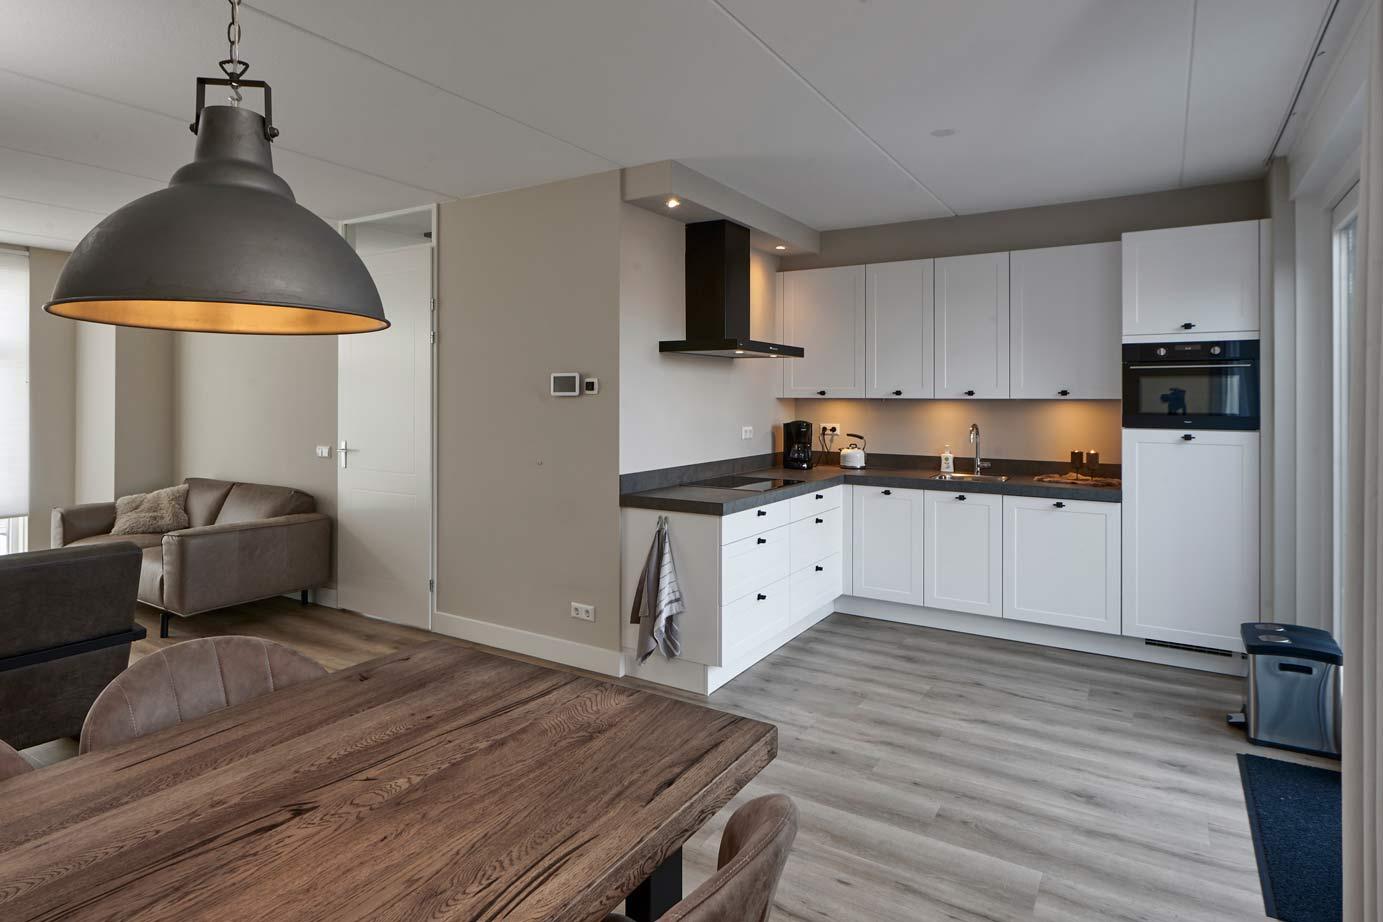 Ardi Keukens Goes : Keuken kopen op schouwen duiveland klantscore db keukens